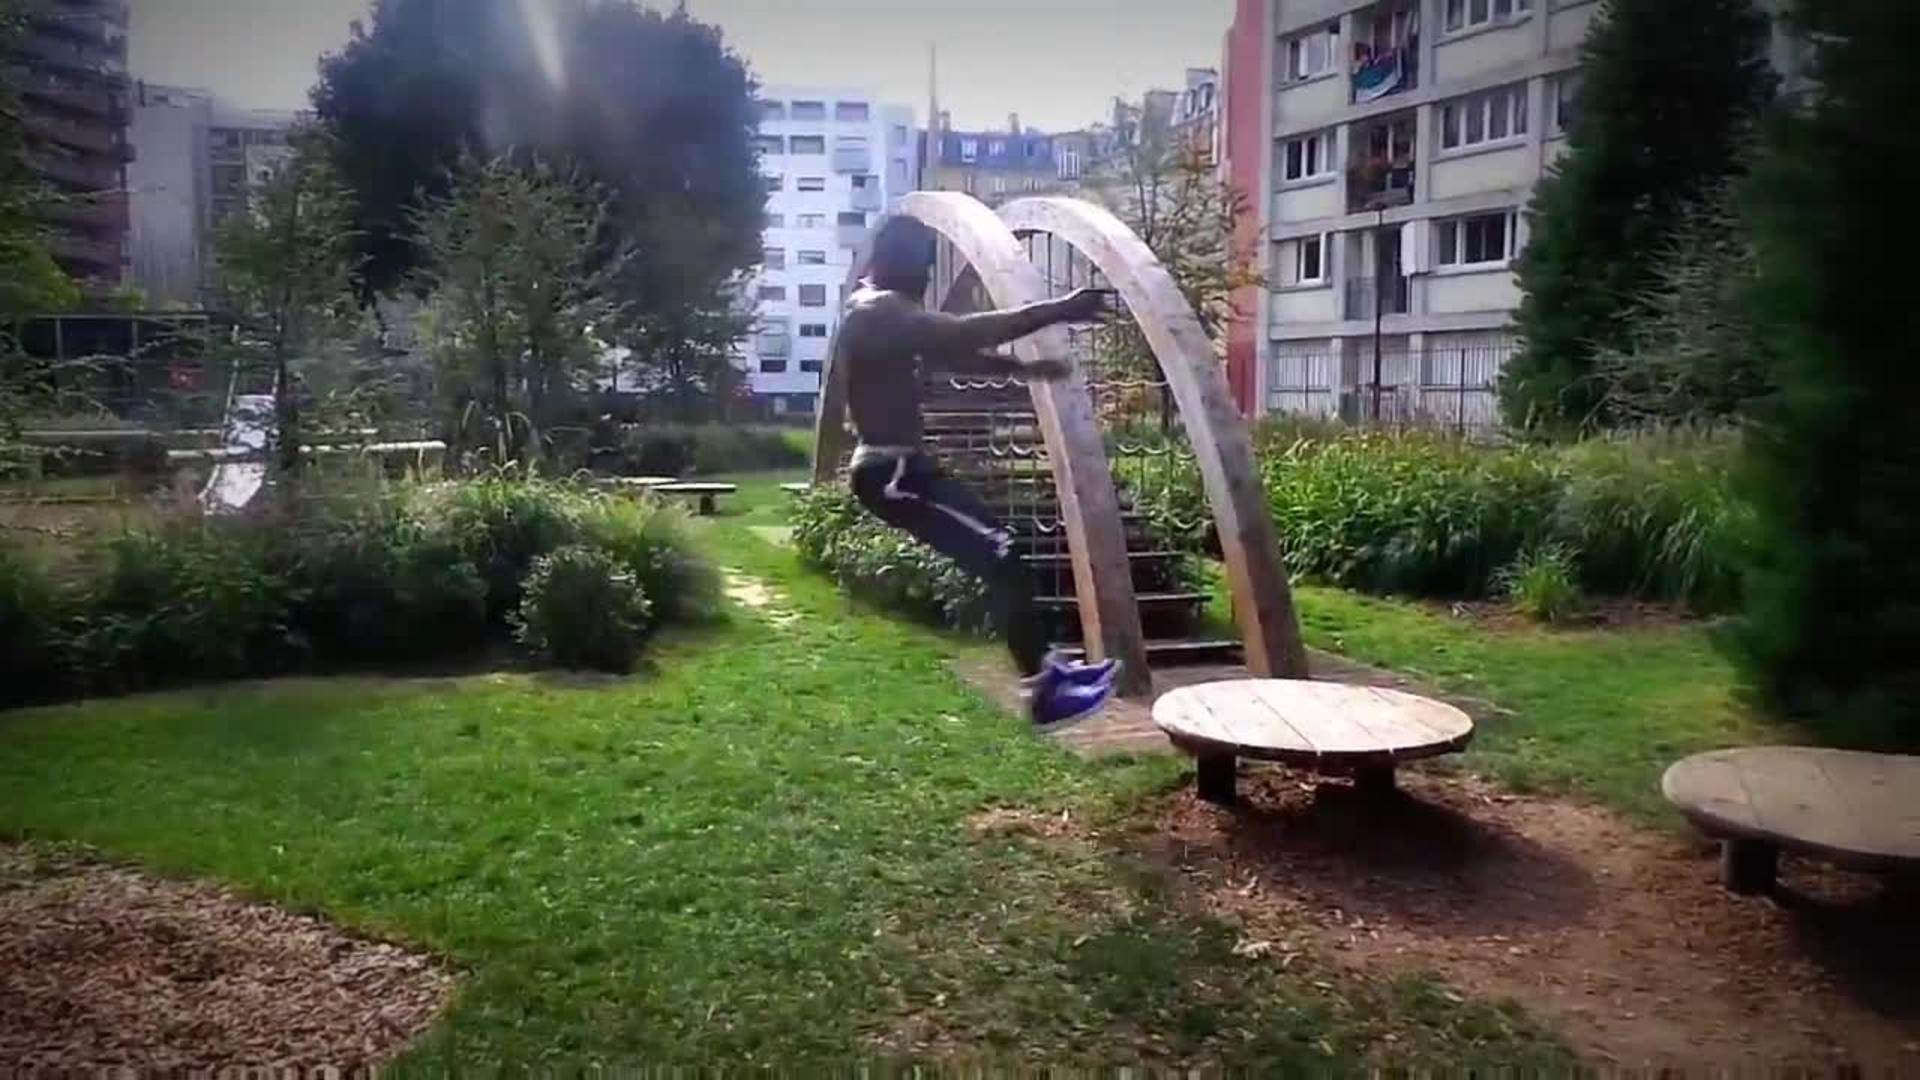 playground parkour flip fail jukin media